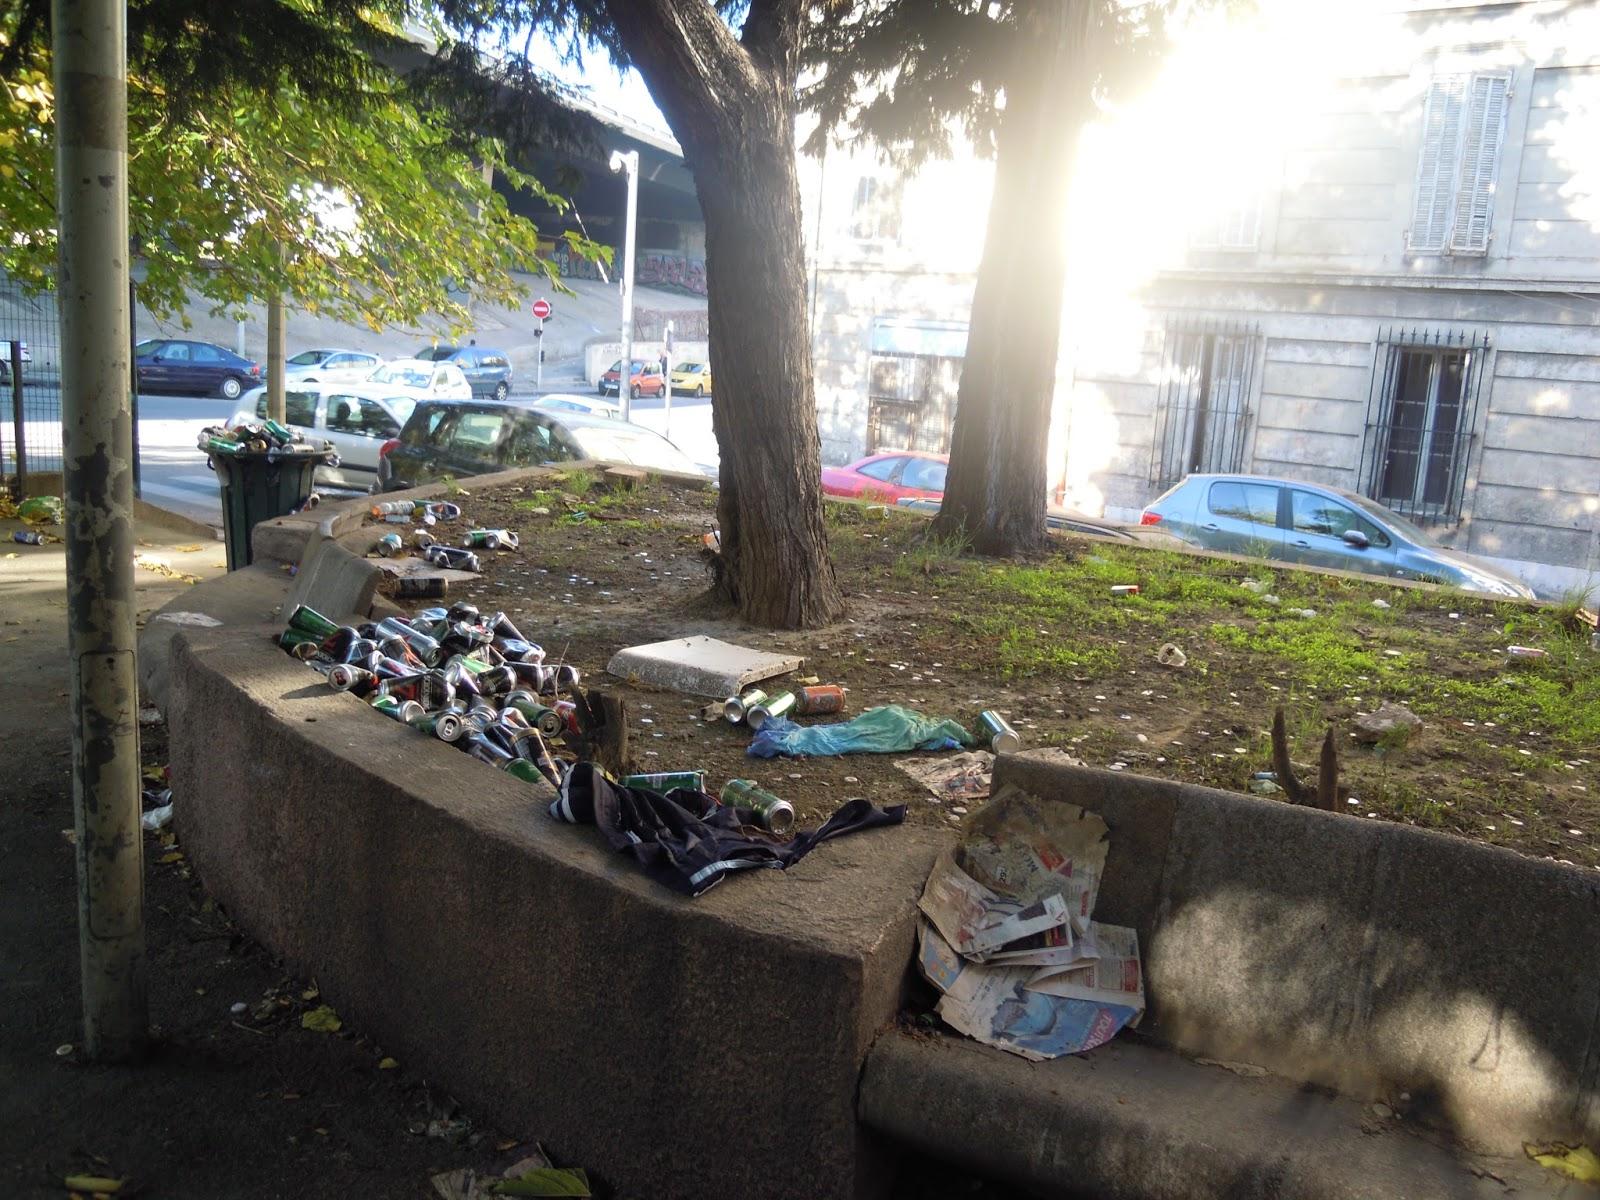 Ciq saint mauront sos entretien jardins for Entretien jardin marseille